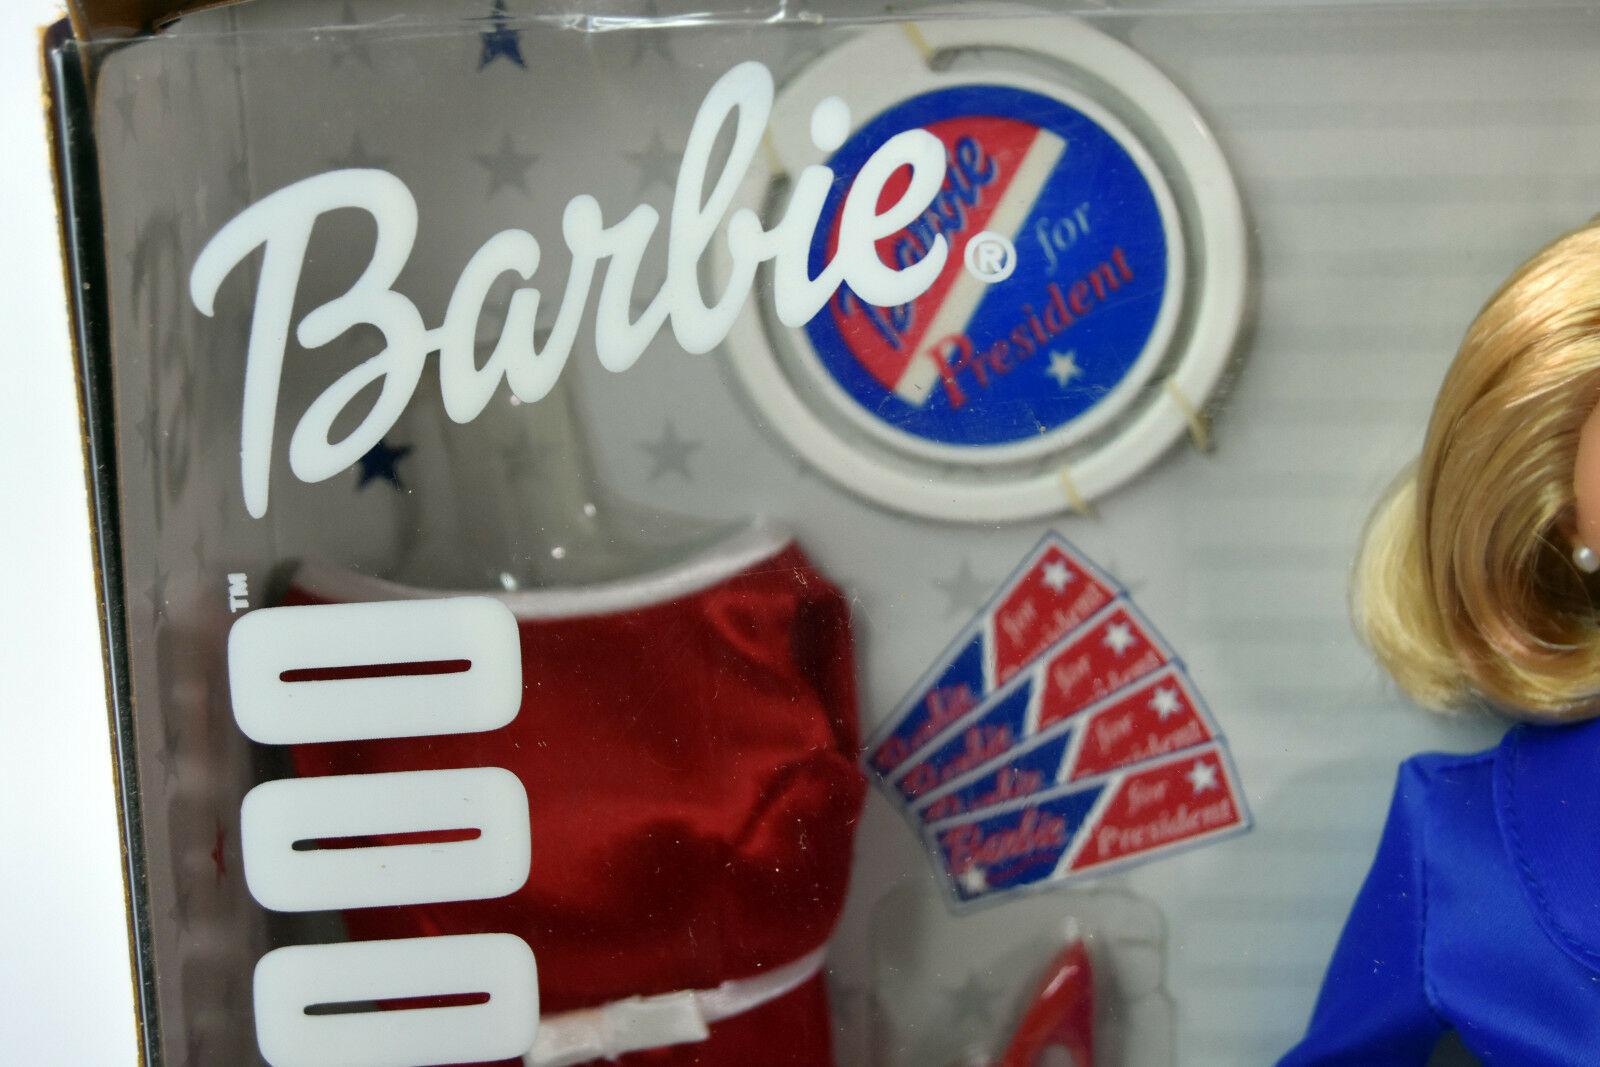 Mattel BARBIE Girls Blonde Doll NIB President 2000 Red Blue Dress White House image 3